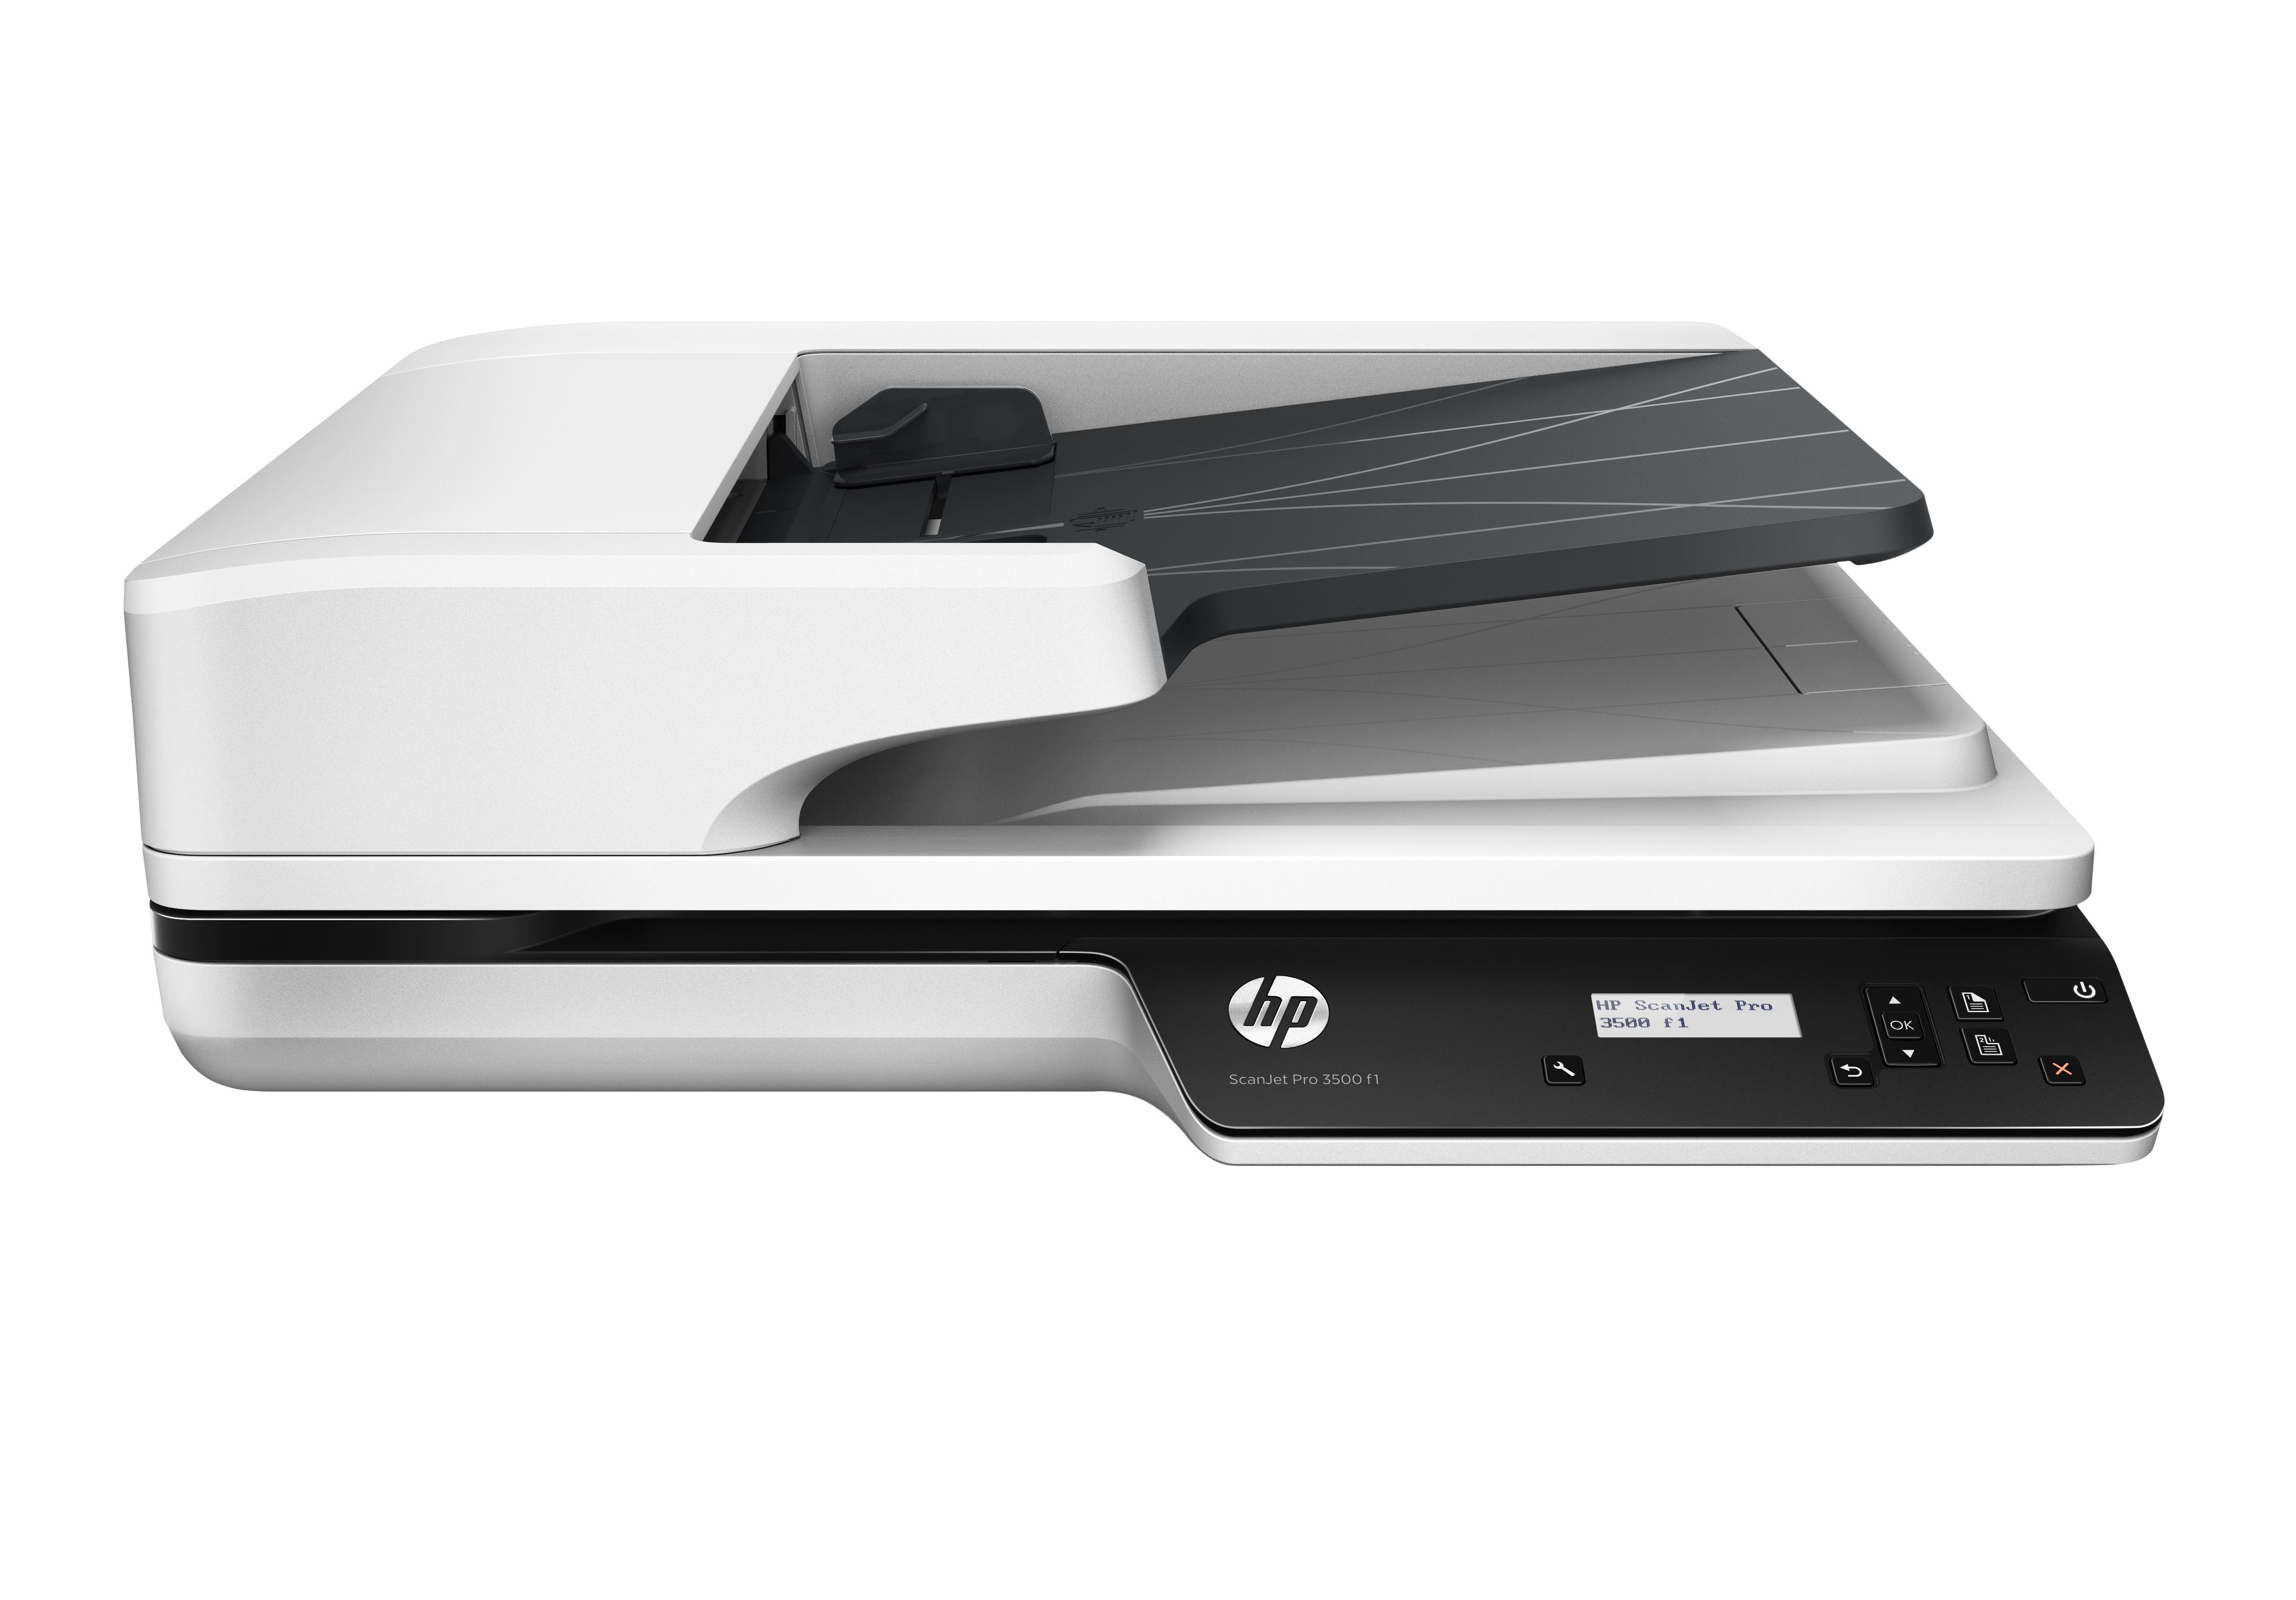 2061337-HP-Scanjet-Pro-3500-f1-1200-x-1200-DPI-Scanner-piano-e-ADF-Grigio-A4-HP